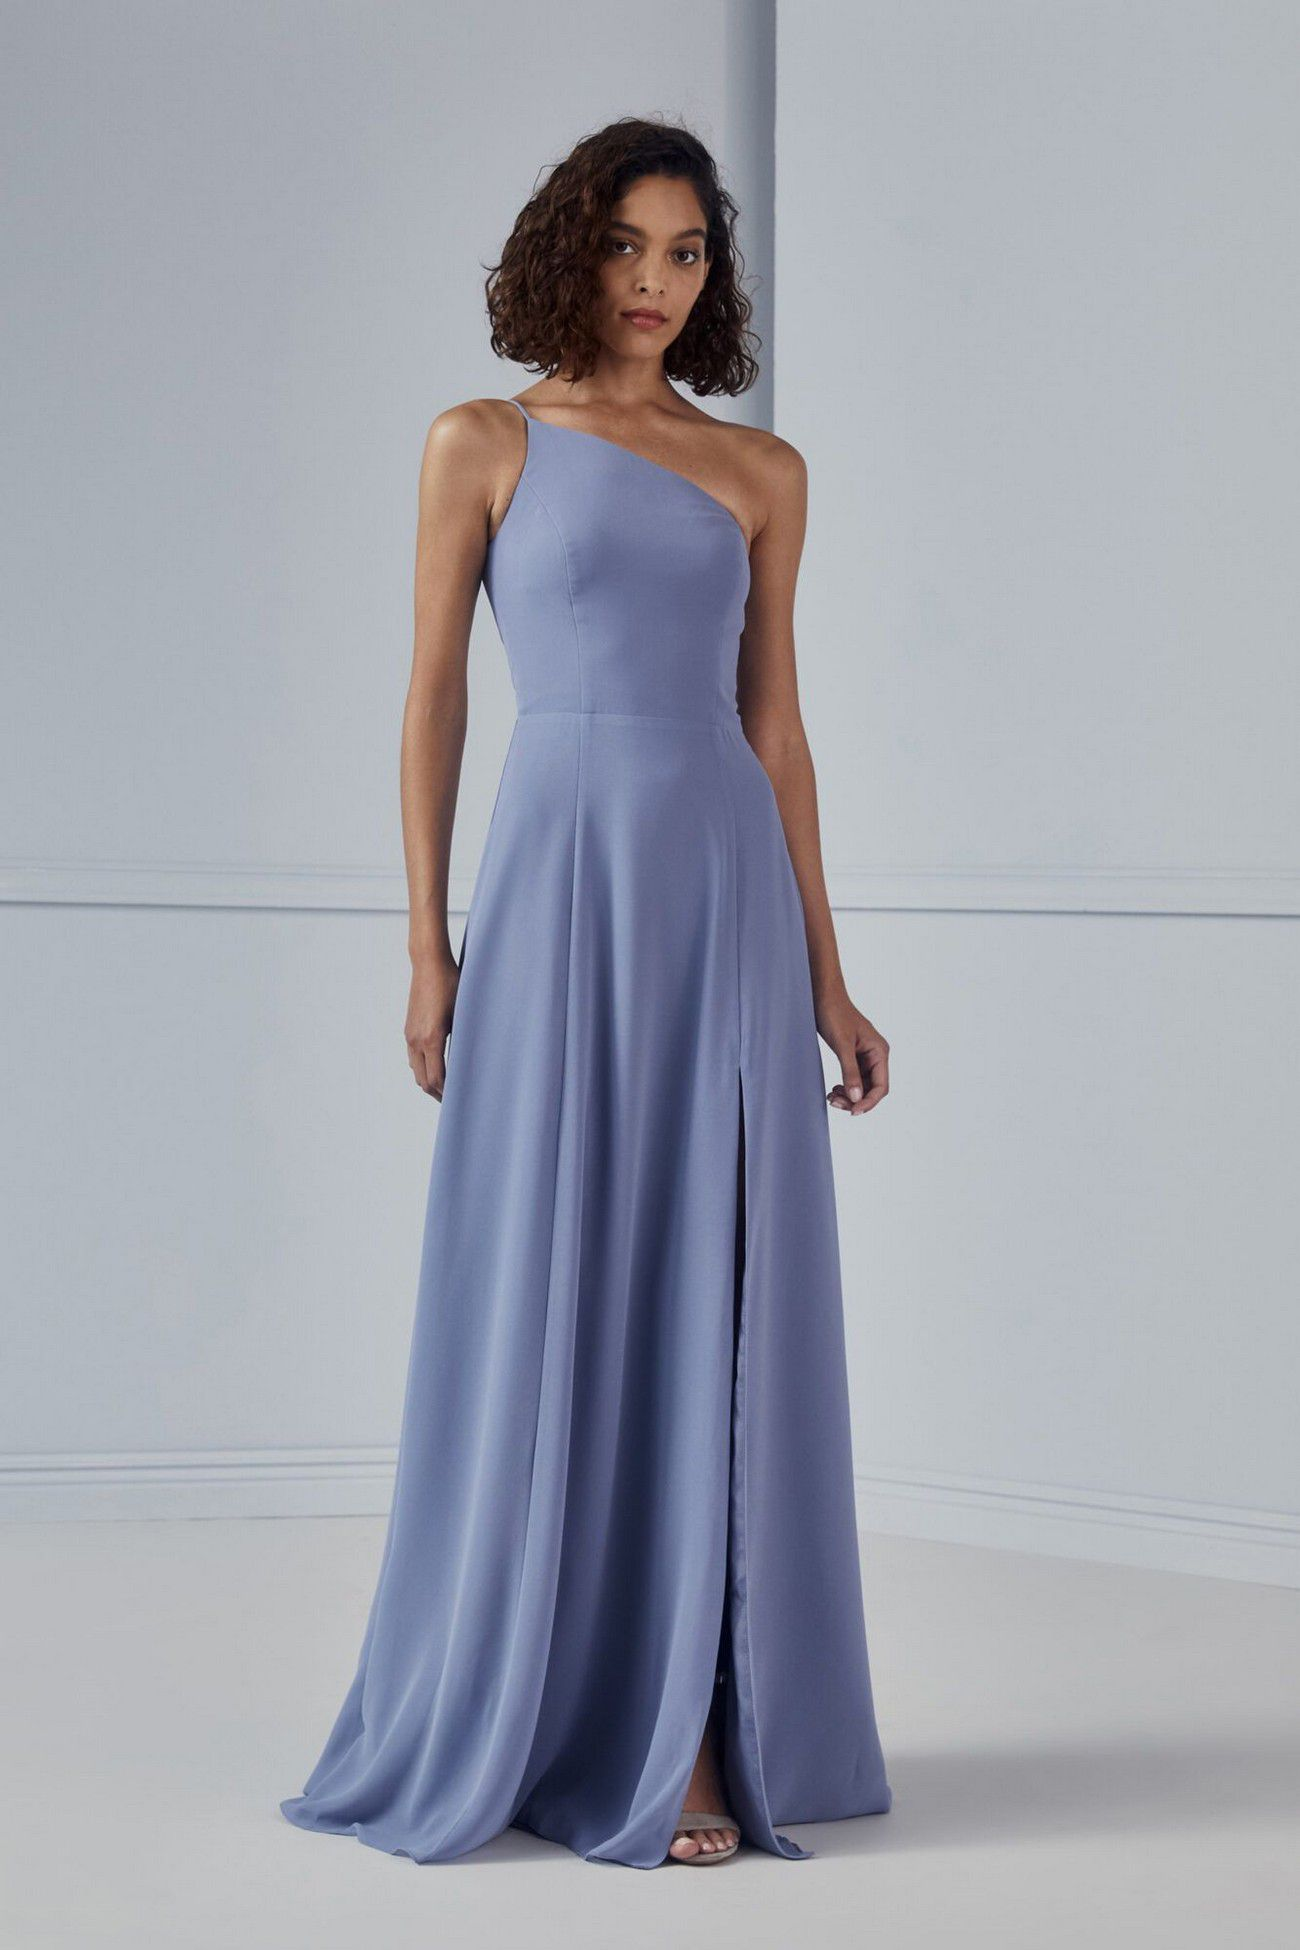 https://www.bridalreflections.com/wp-content/uploads/2020/09/Bridesmaids-CHIARA-GB159F-One-shoulder-Circle-skirt-Side-slit-Flat-Chiffon-Front-1333x2000.jpg